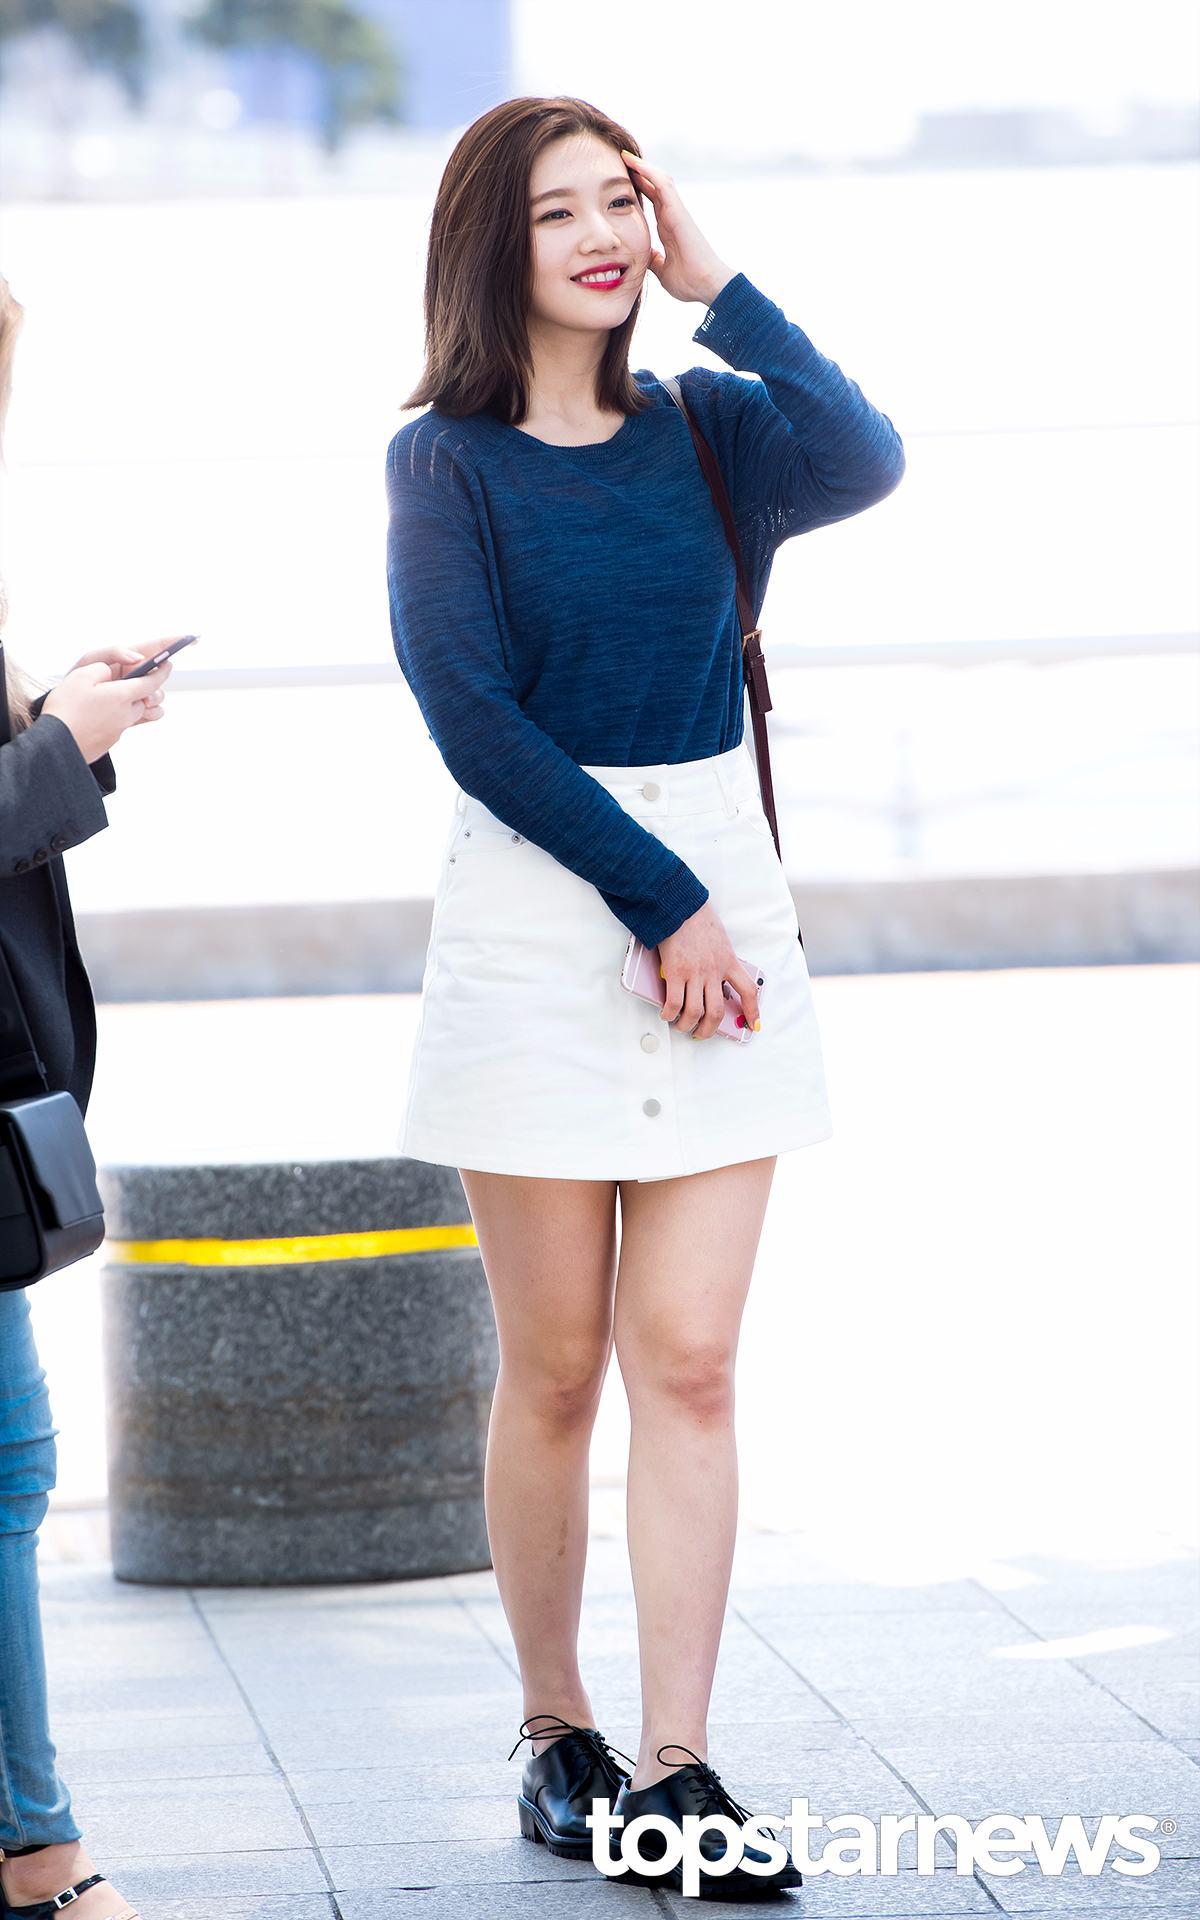 ✽ Red Velvet Joy 肉肉的Joy瘦下來之後越來越漂亮啦~~尤其是最近參加年末典禮的Joy根本氣場全開啊~~